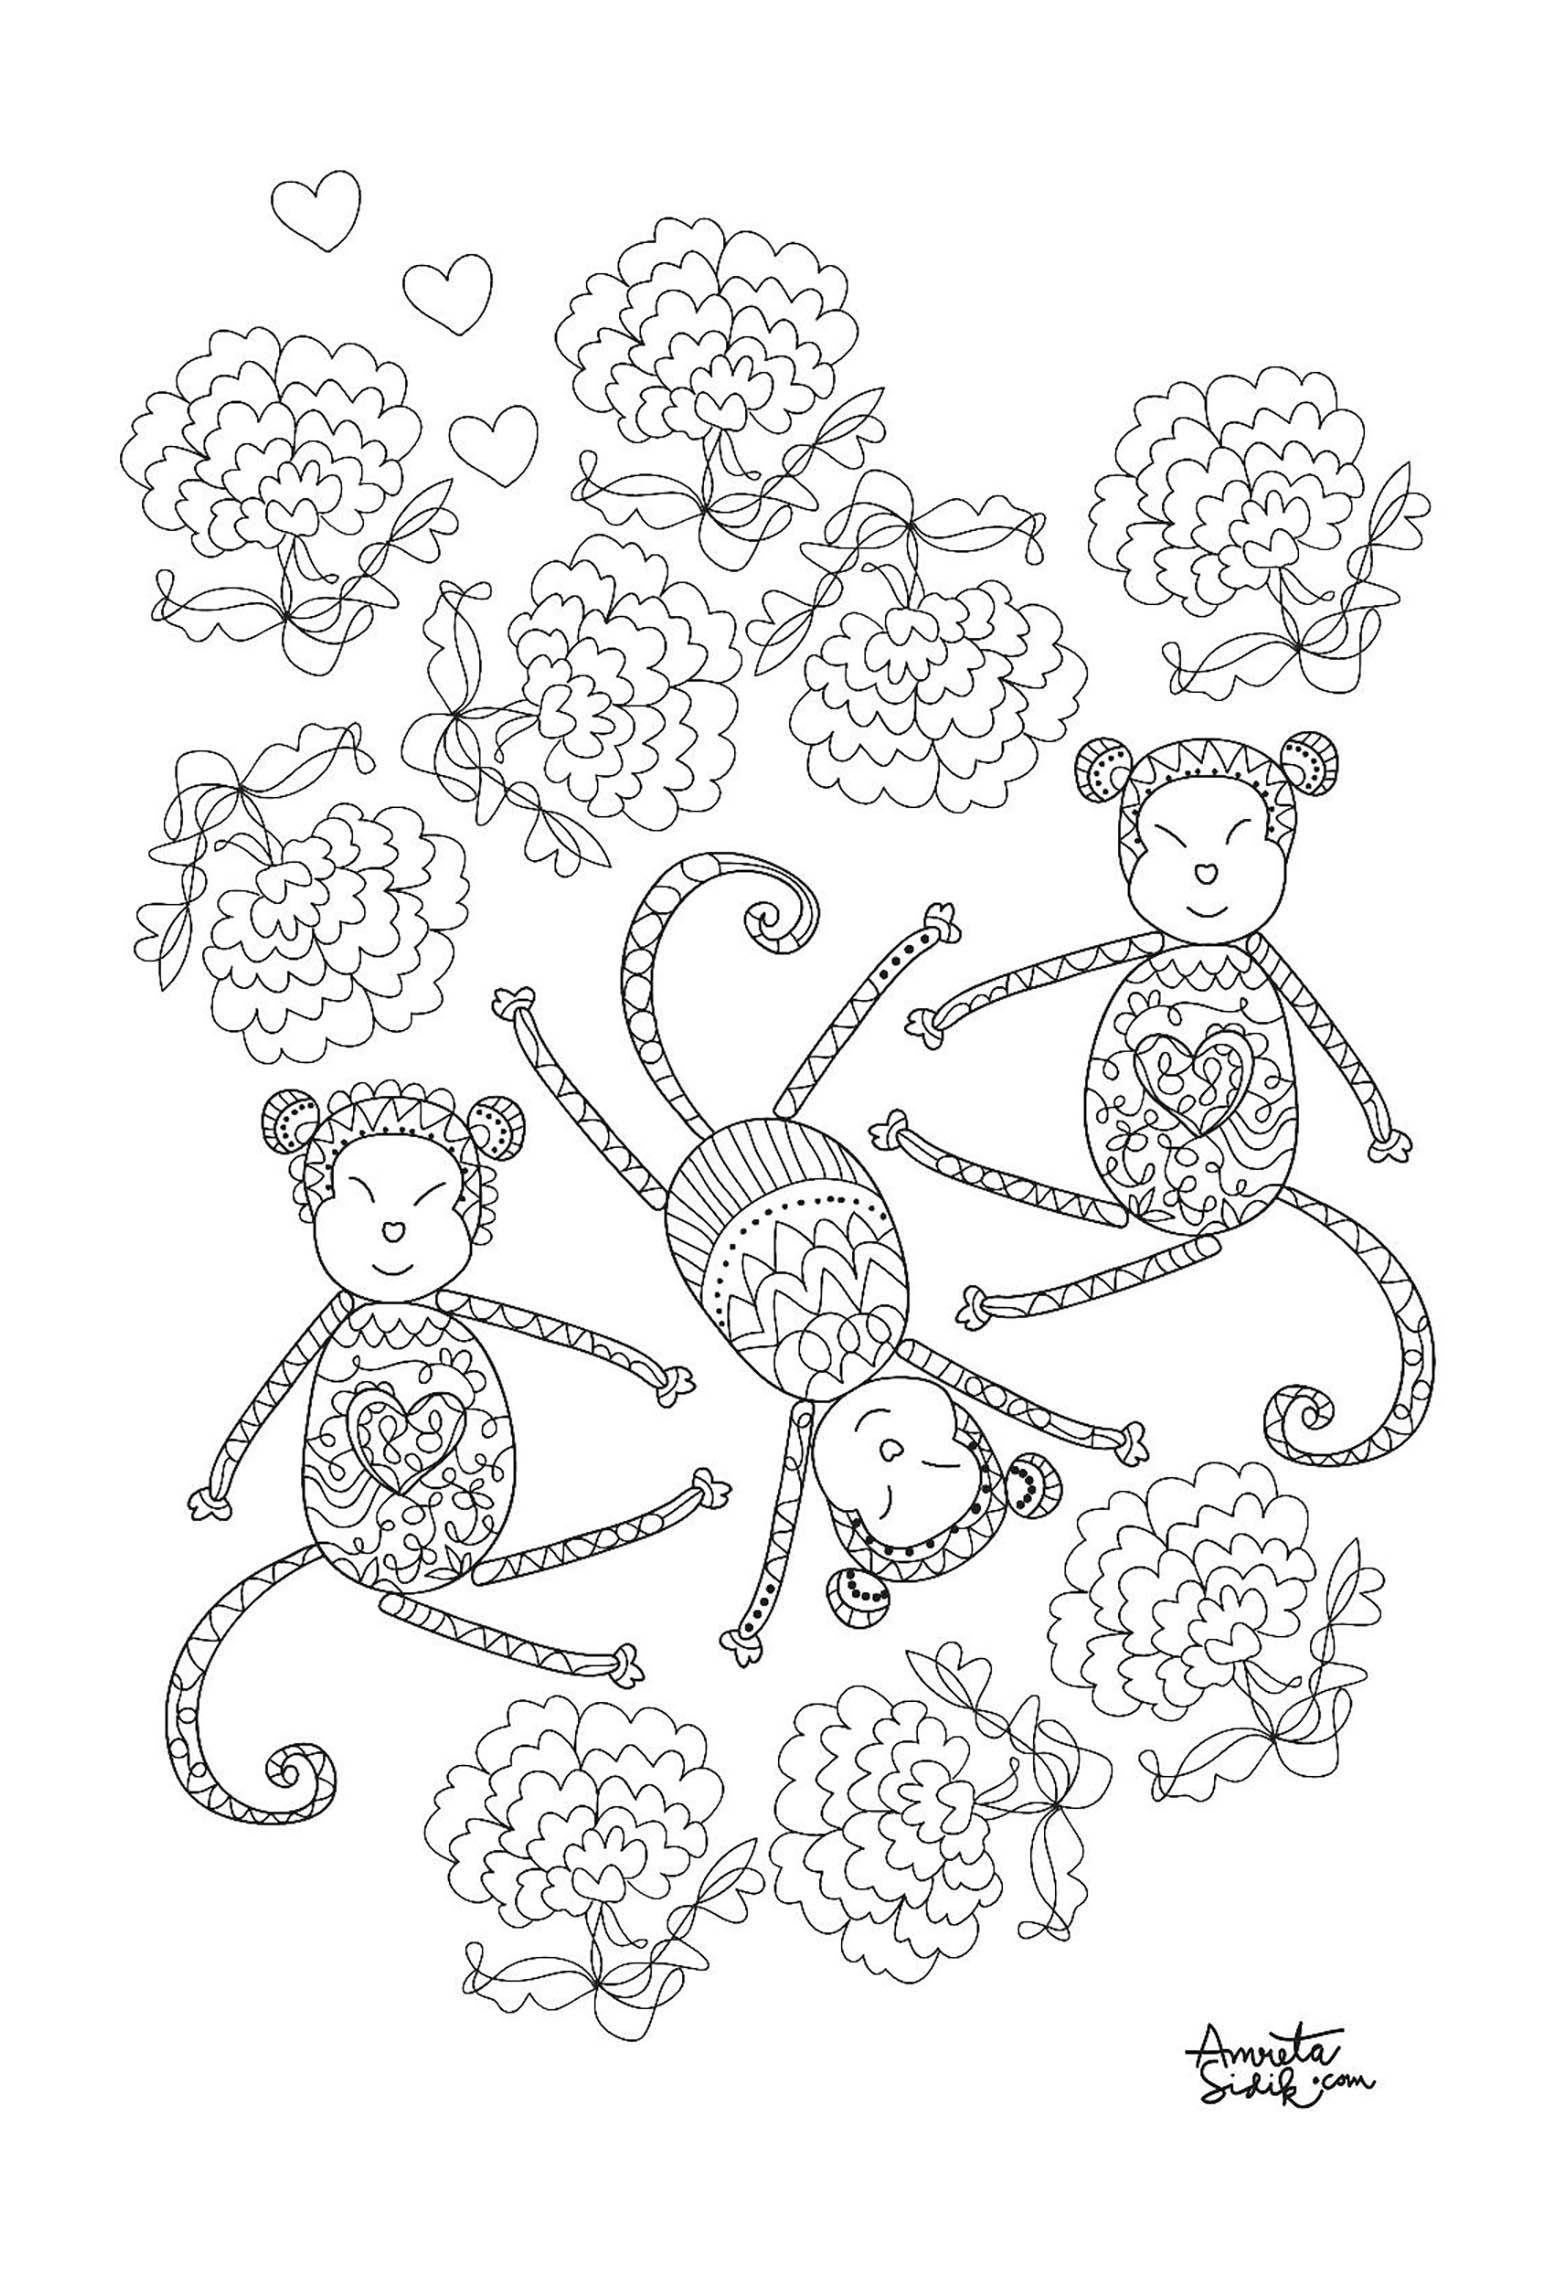 Malbuch Fur Erwachsene  : Monkeys - 2